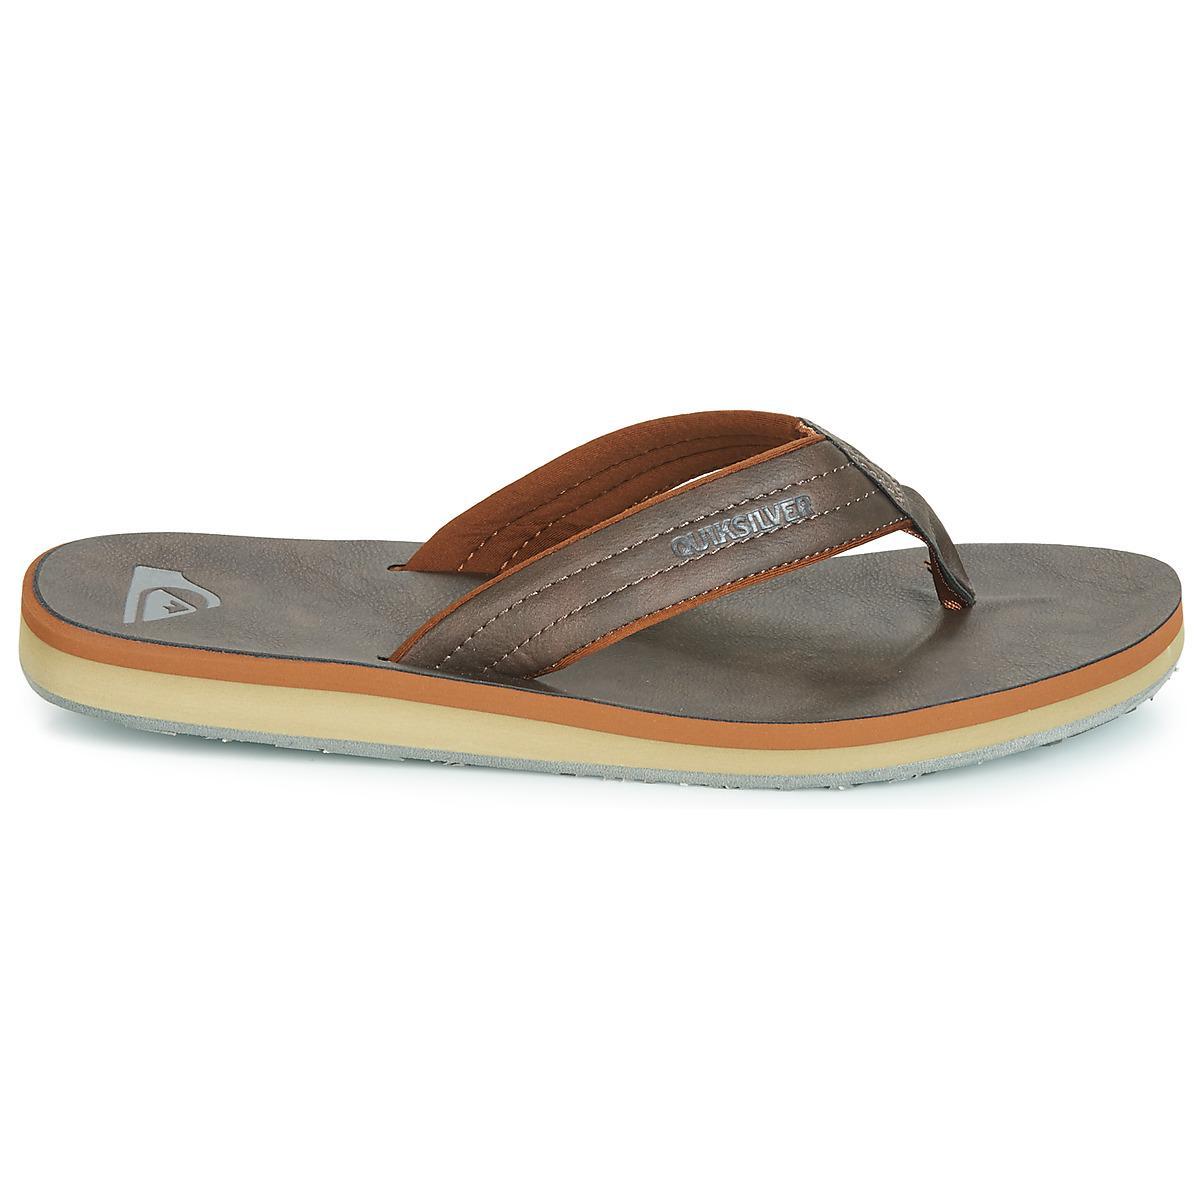 6f9dad4c810b Quiksilver - Brown Carver Nubuck M Sndl Ctk1 Flip Flops   Sandals (shoes)  for. View fullscreen